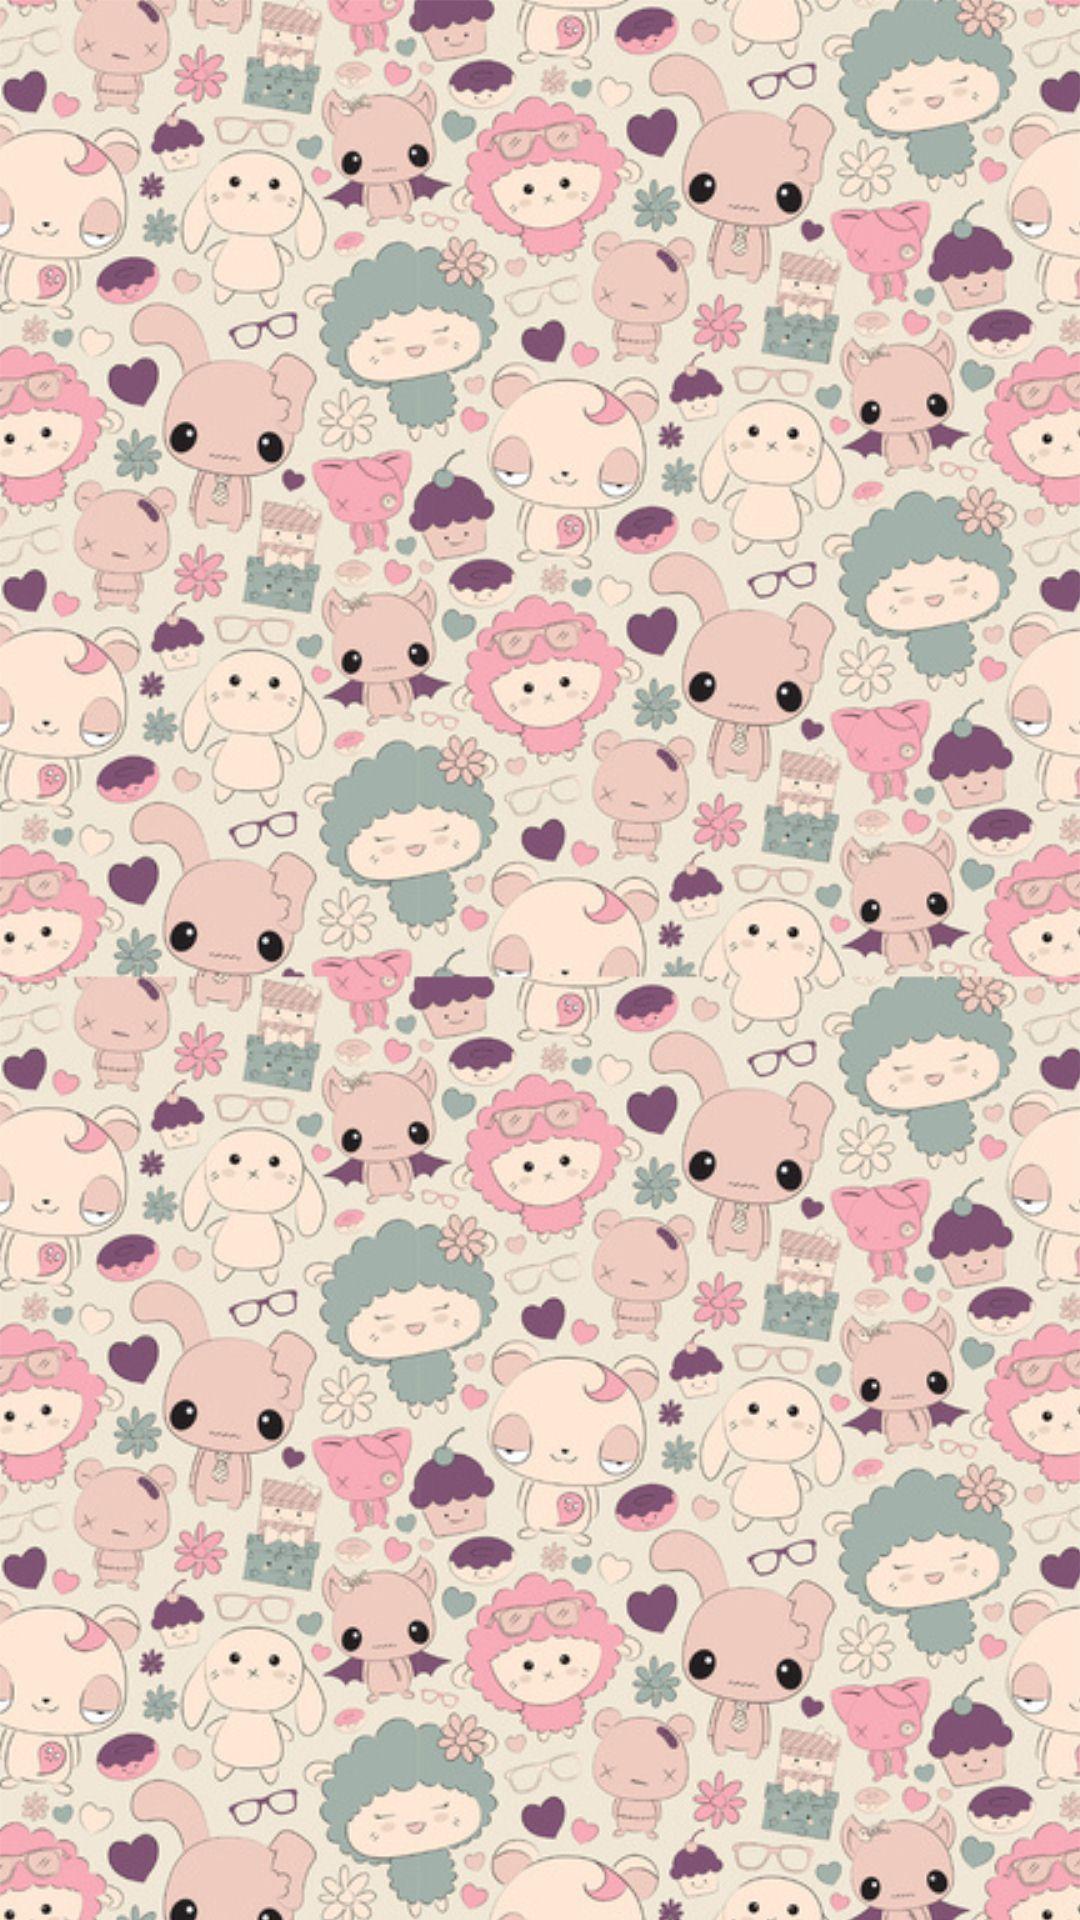 Cute Pink Pastel Wallpaper Kawaii Iphone Wallpapers Pixelstalk Net